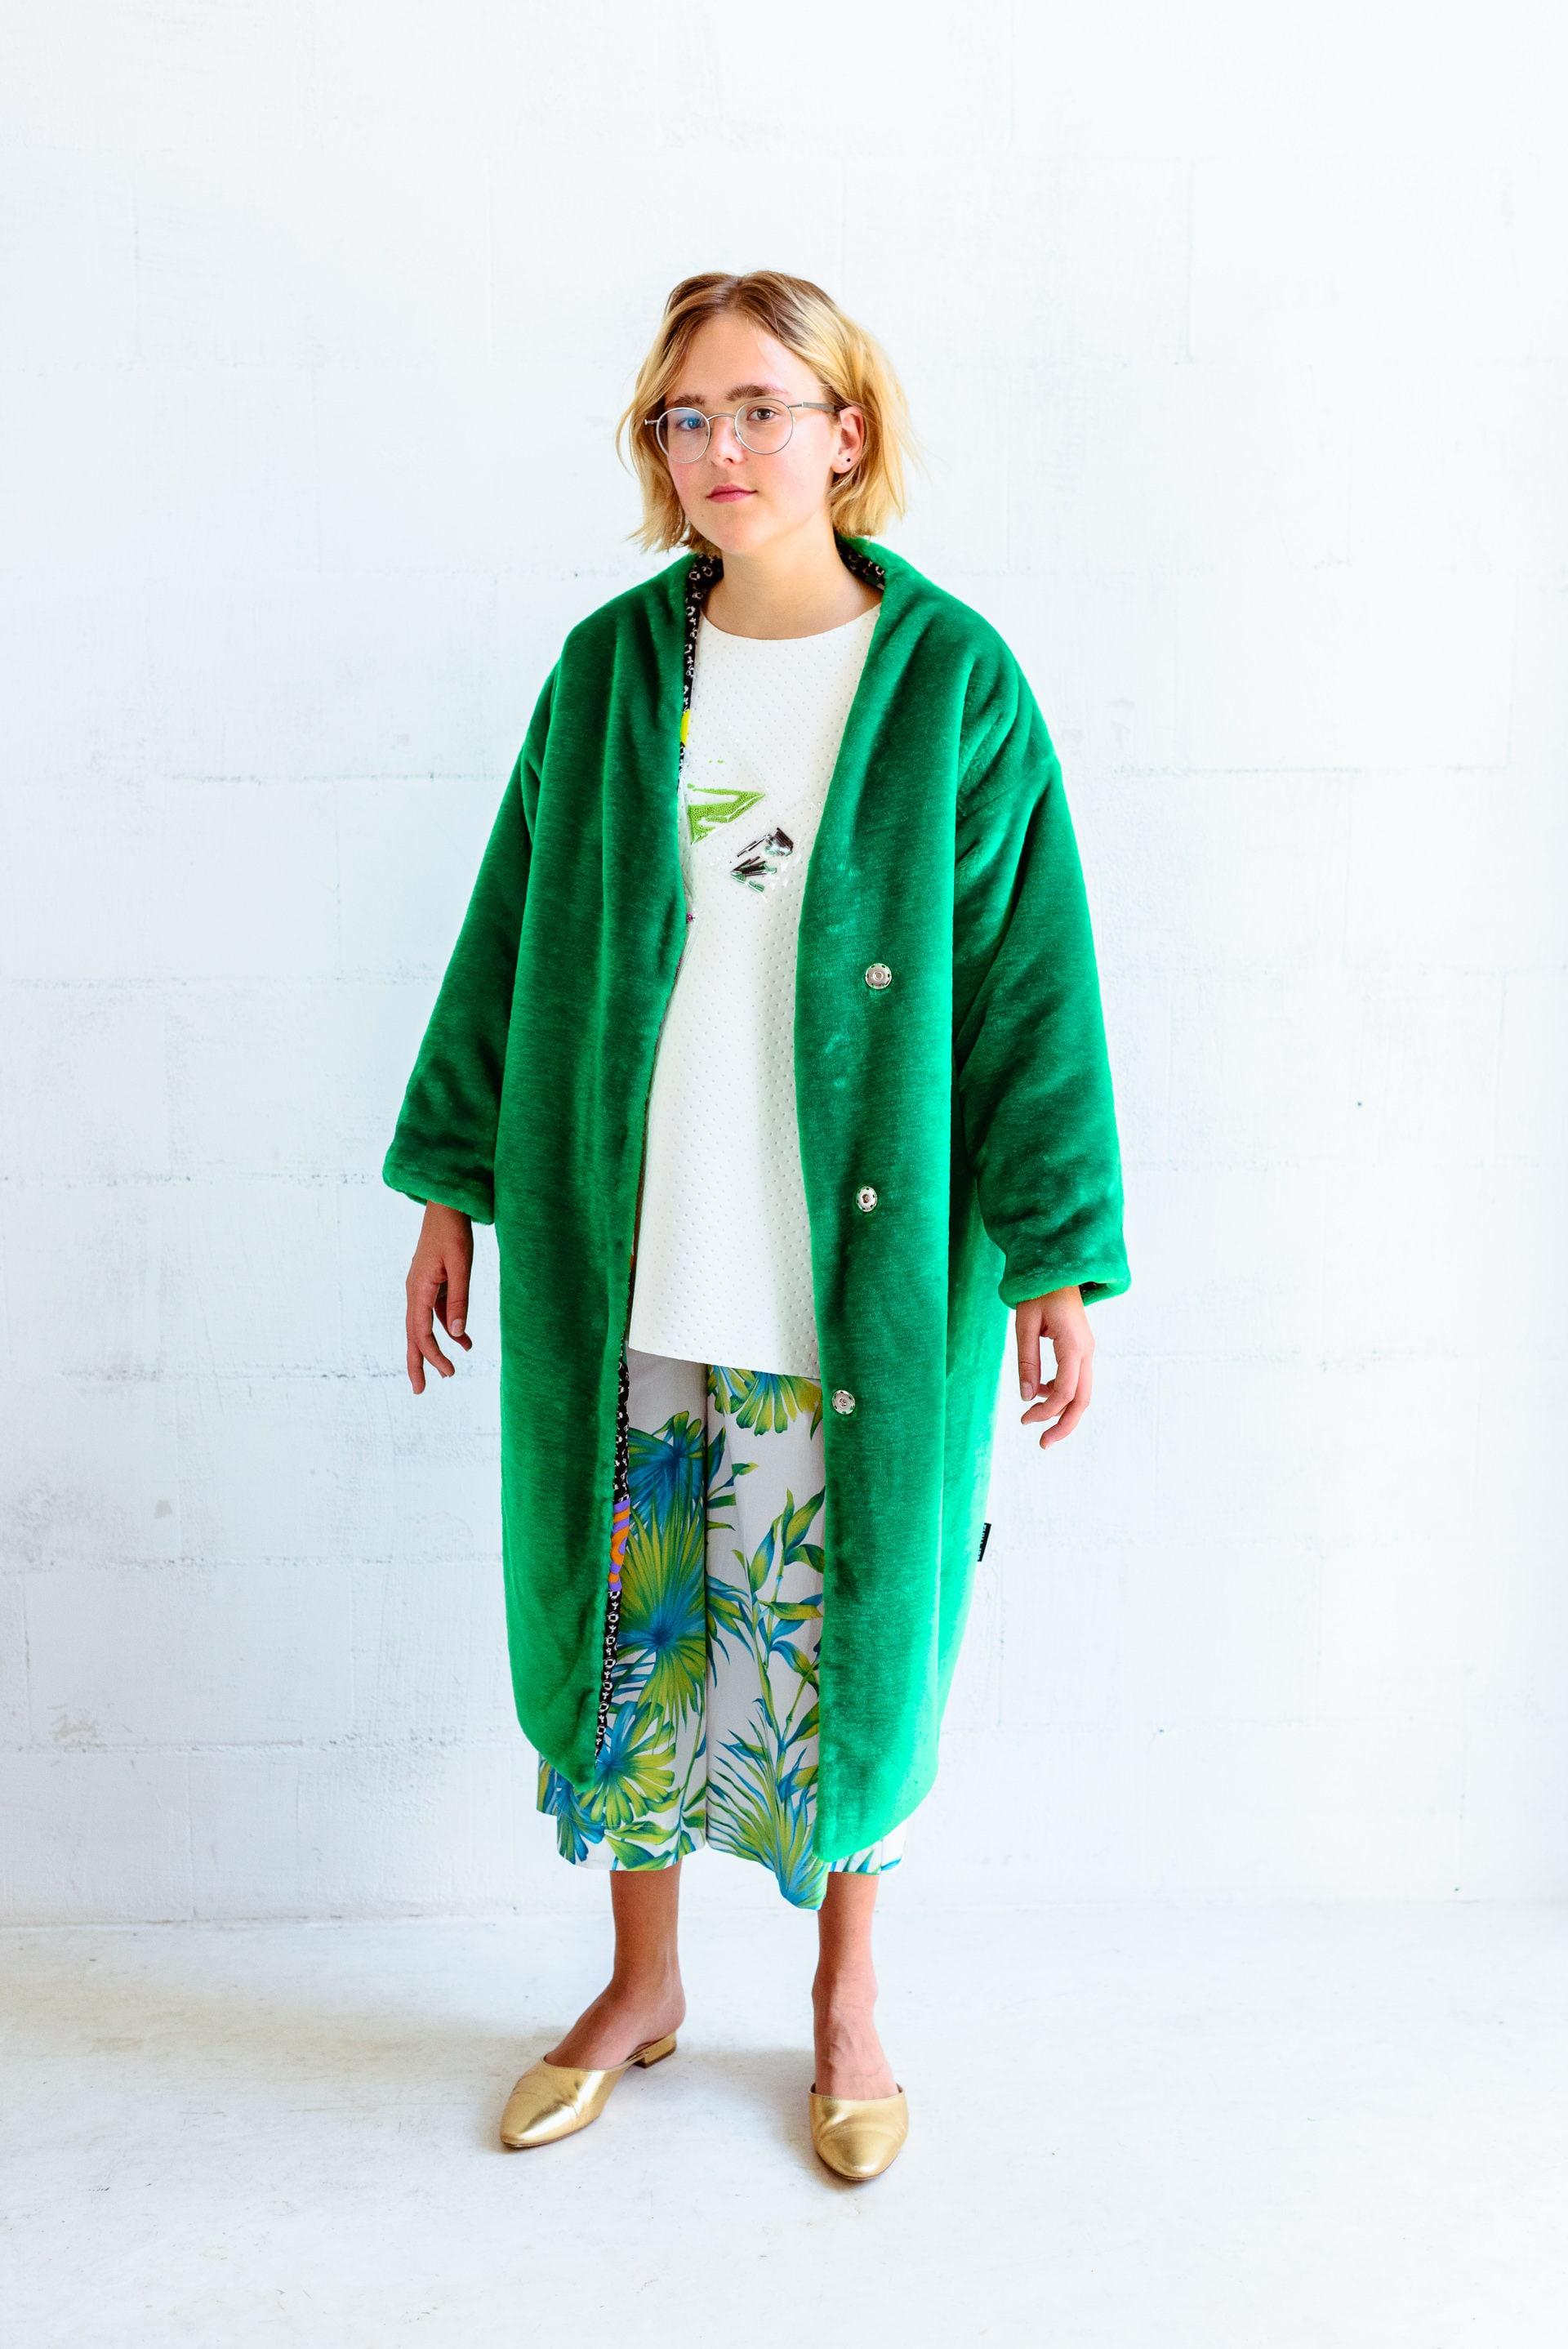 teddy bear coat green unisex fur faux fur jacket soft winter. Black Bedroom Furniture Sets. Home Design Ideas